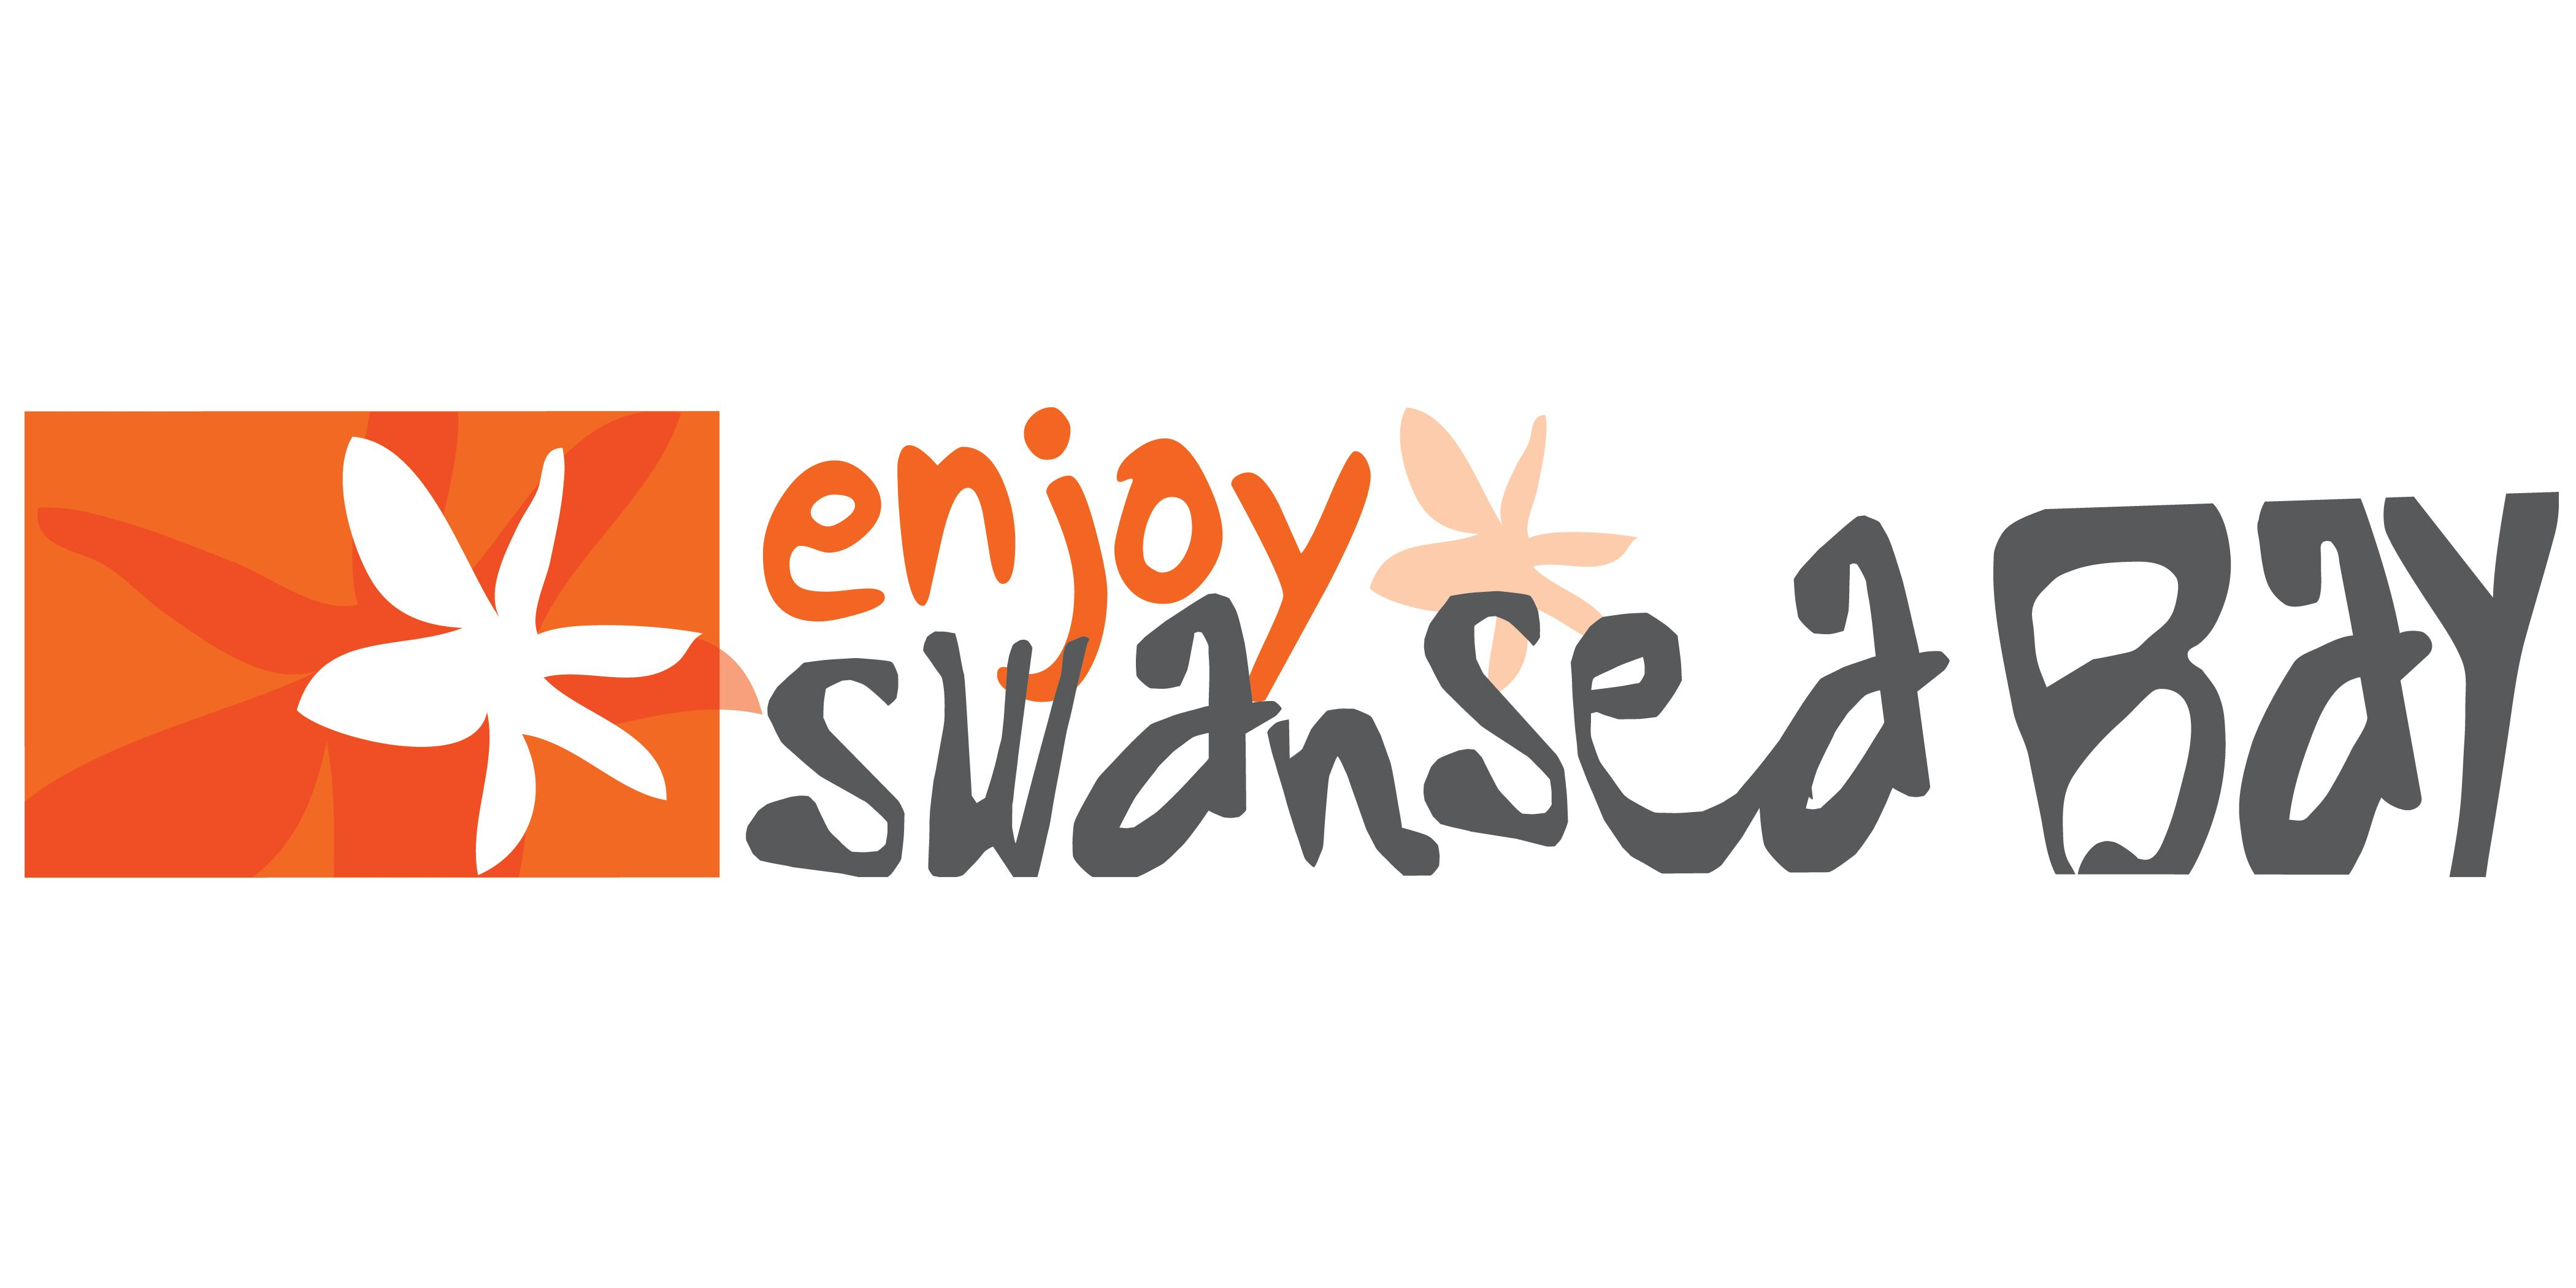 Enjoy Swansea Bay!